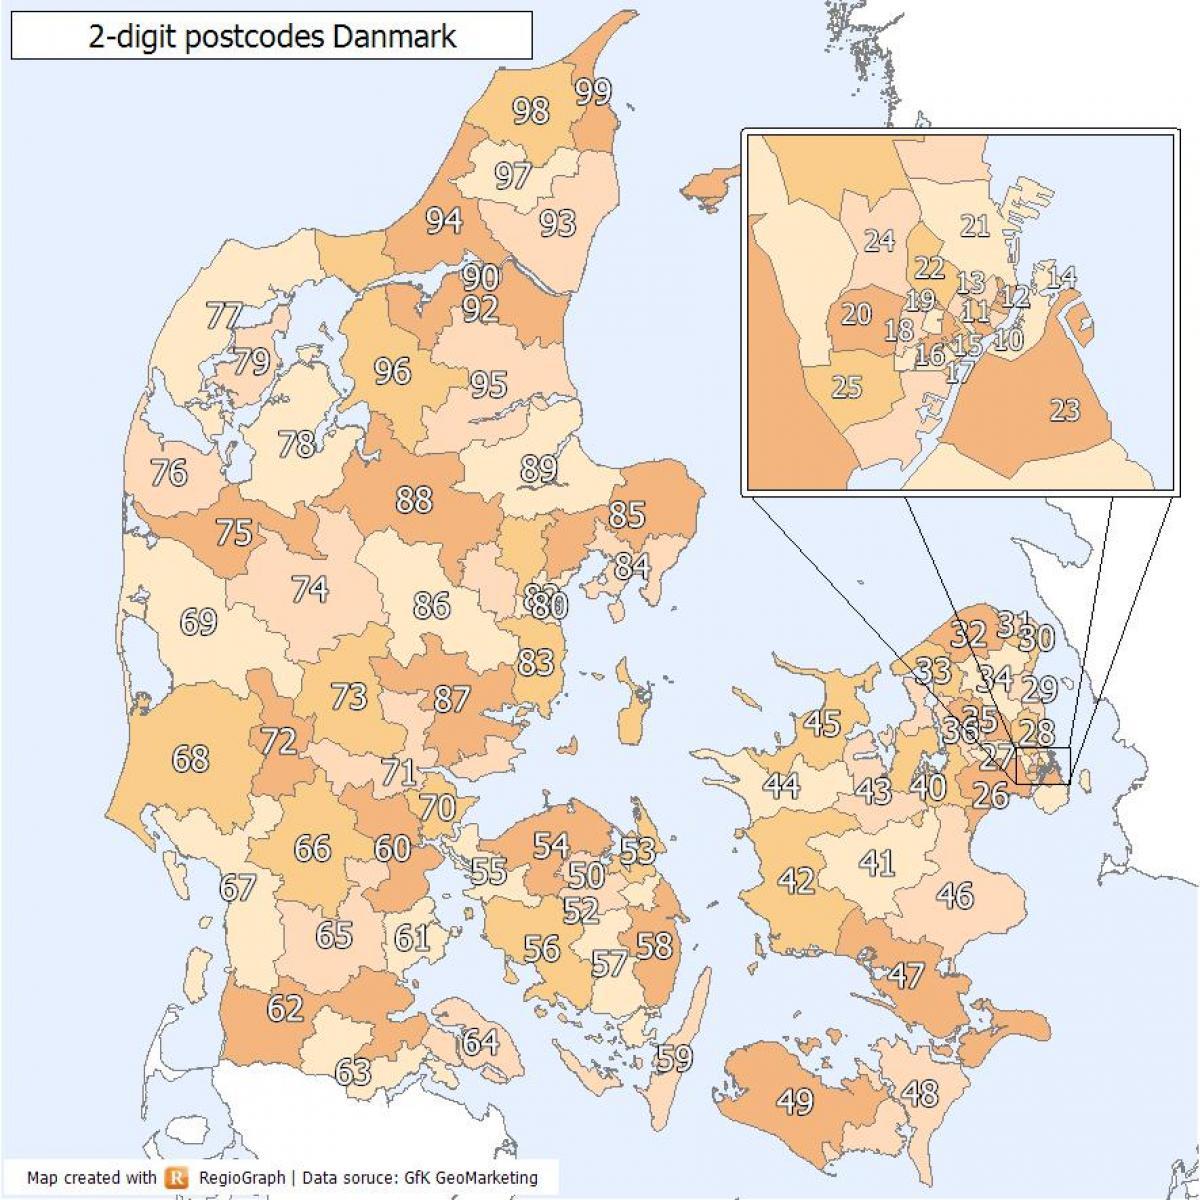 dänemark plz karte Dänemark PLZ Karte   Dänemark zip code Karte (Europa Nord   Europa)